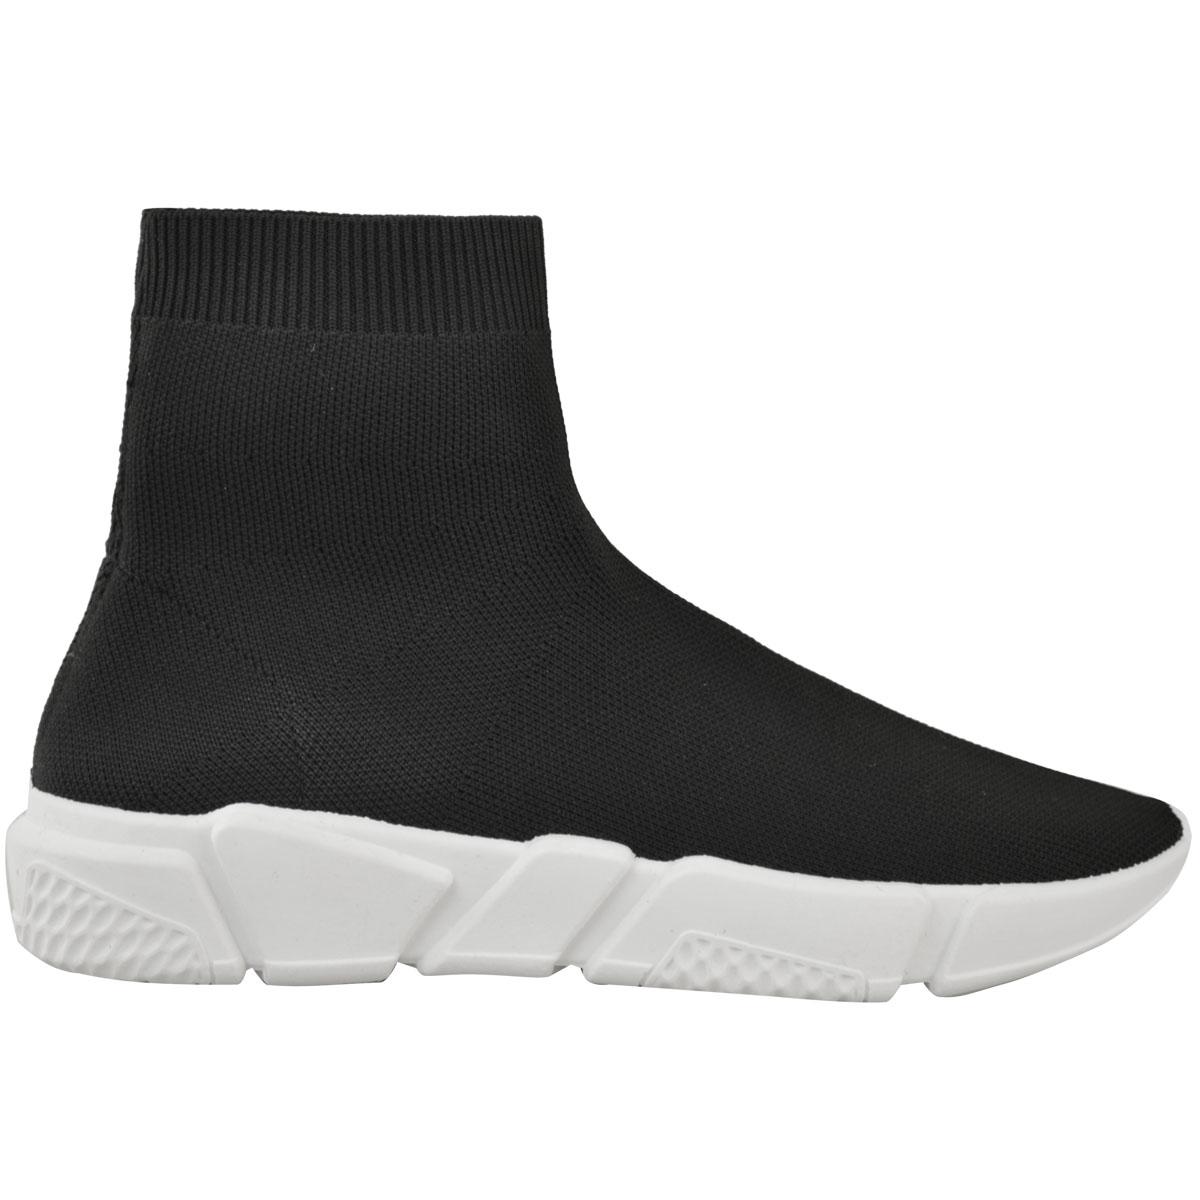 Ladies Uk ginnastica da Scarpe White Chunky Womens Knit Black Stretch Runners Sneakers Taglia Speed Sock SHdPqw